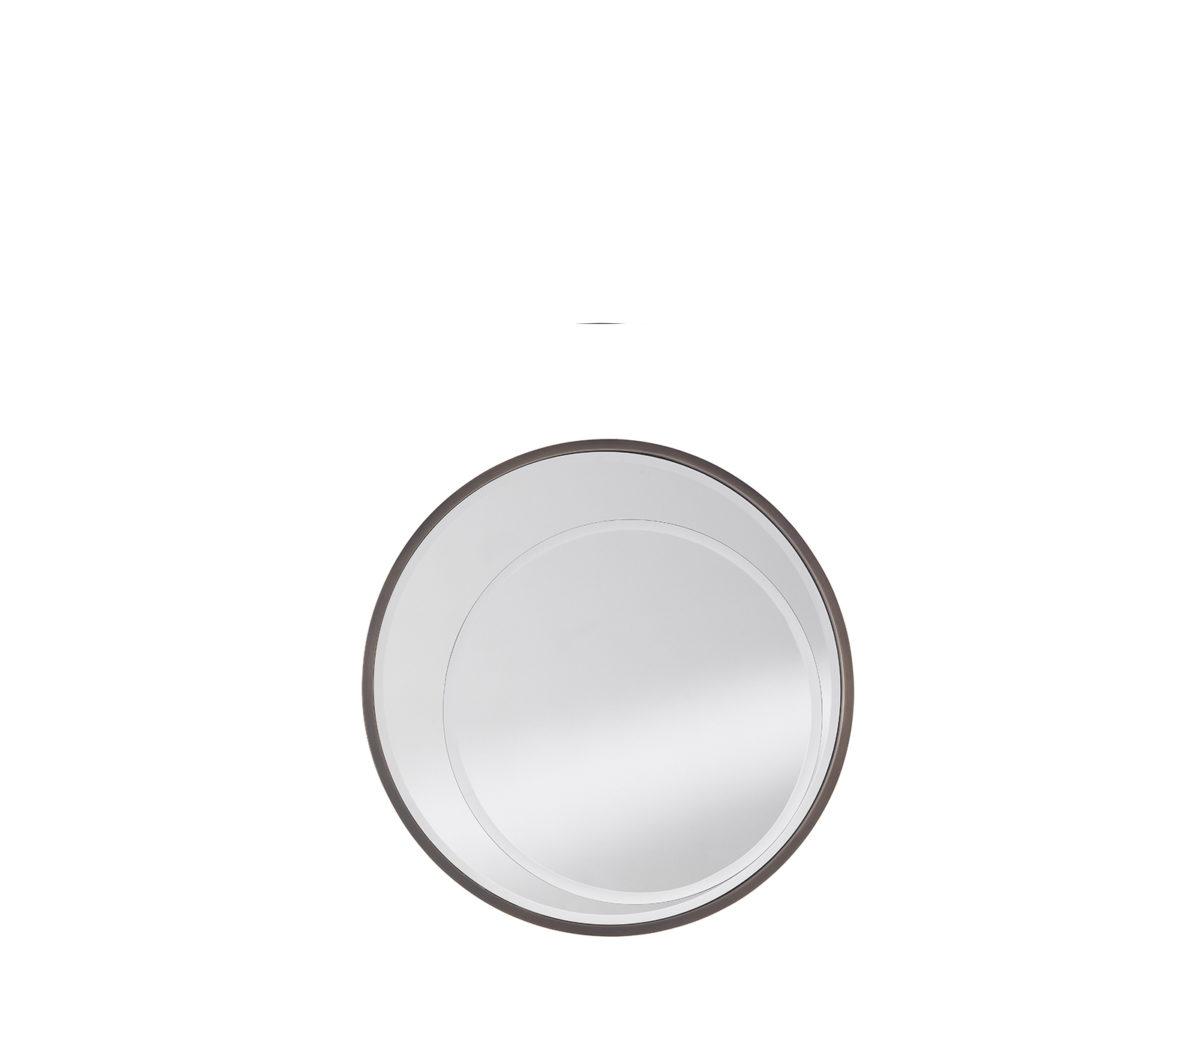 Gianfranco Ferre Home Carrol 2 Mirror